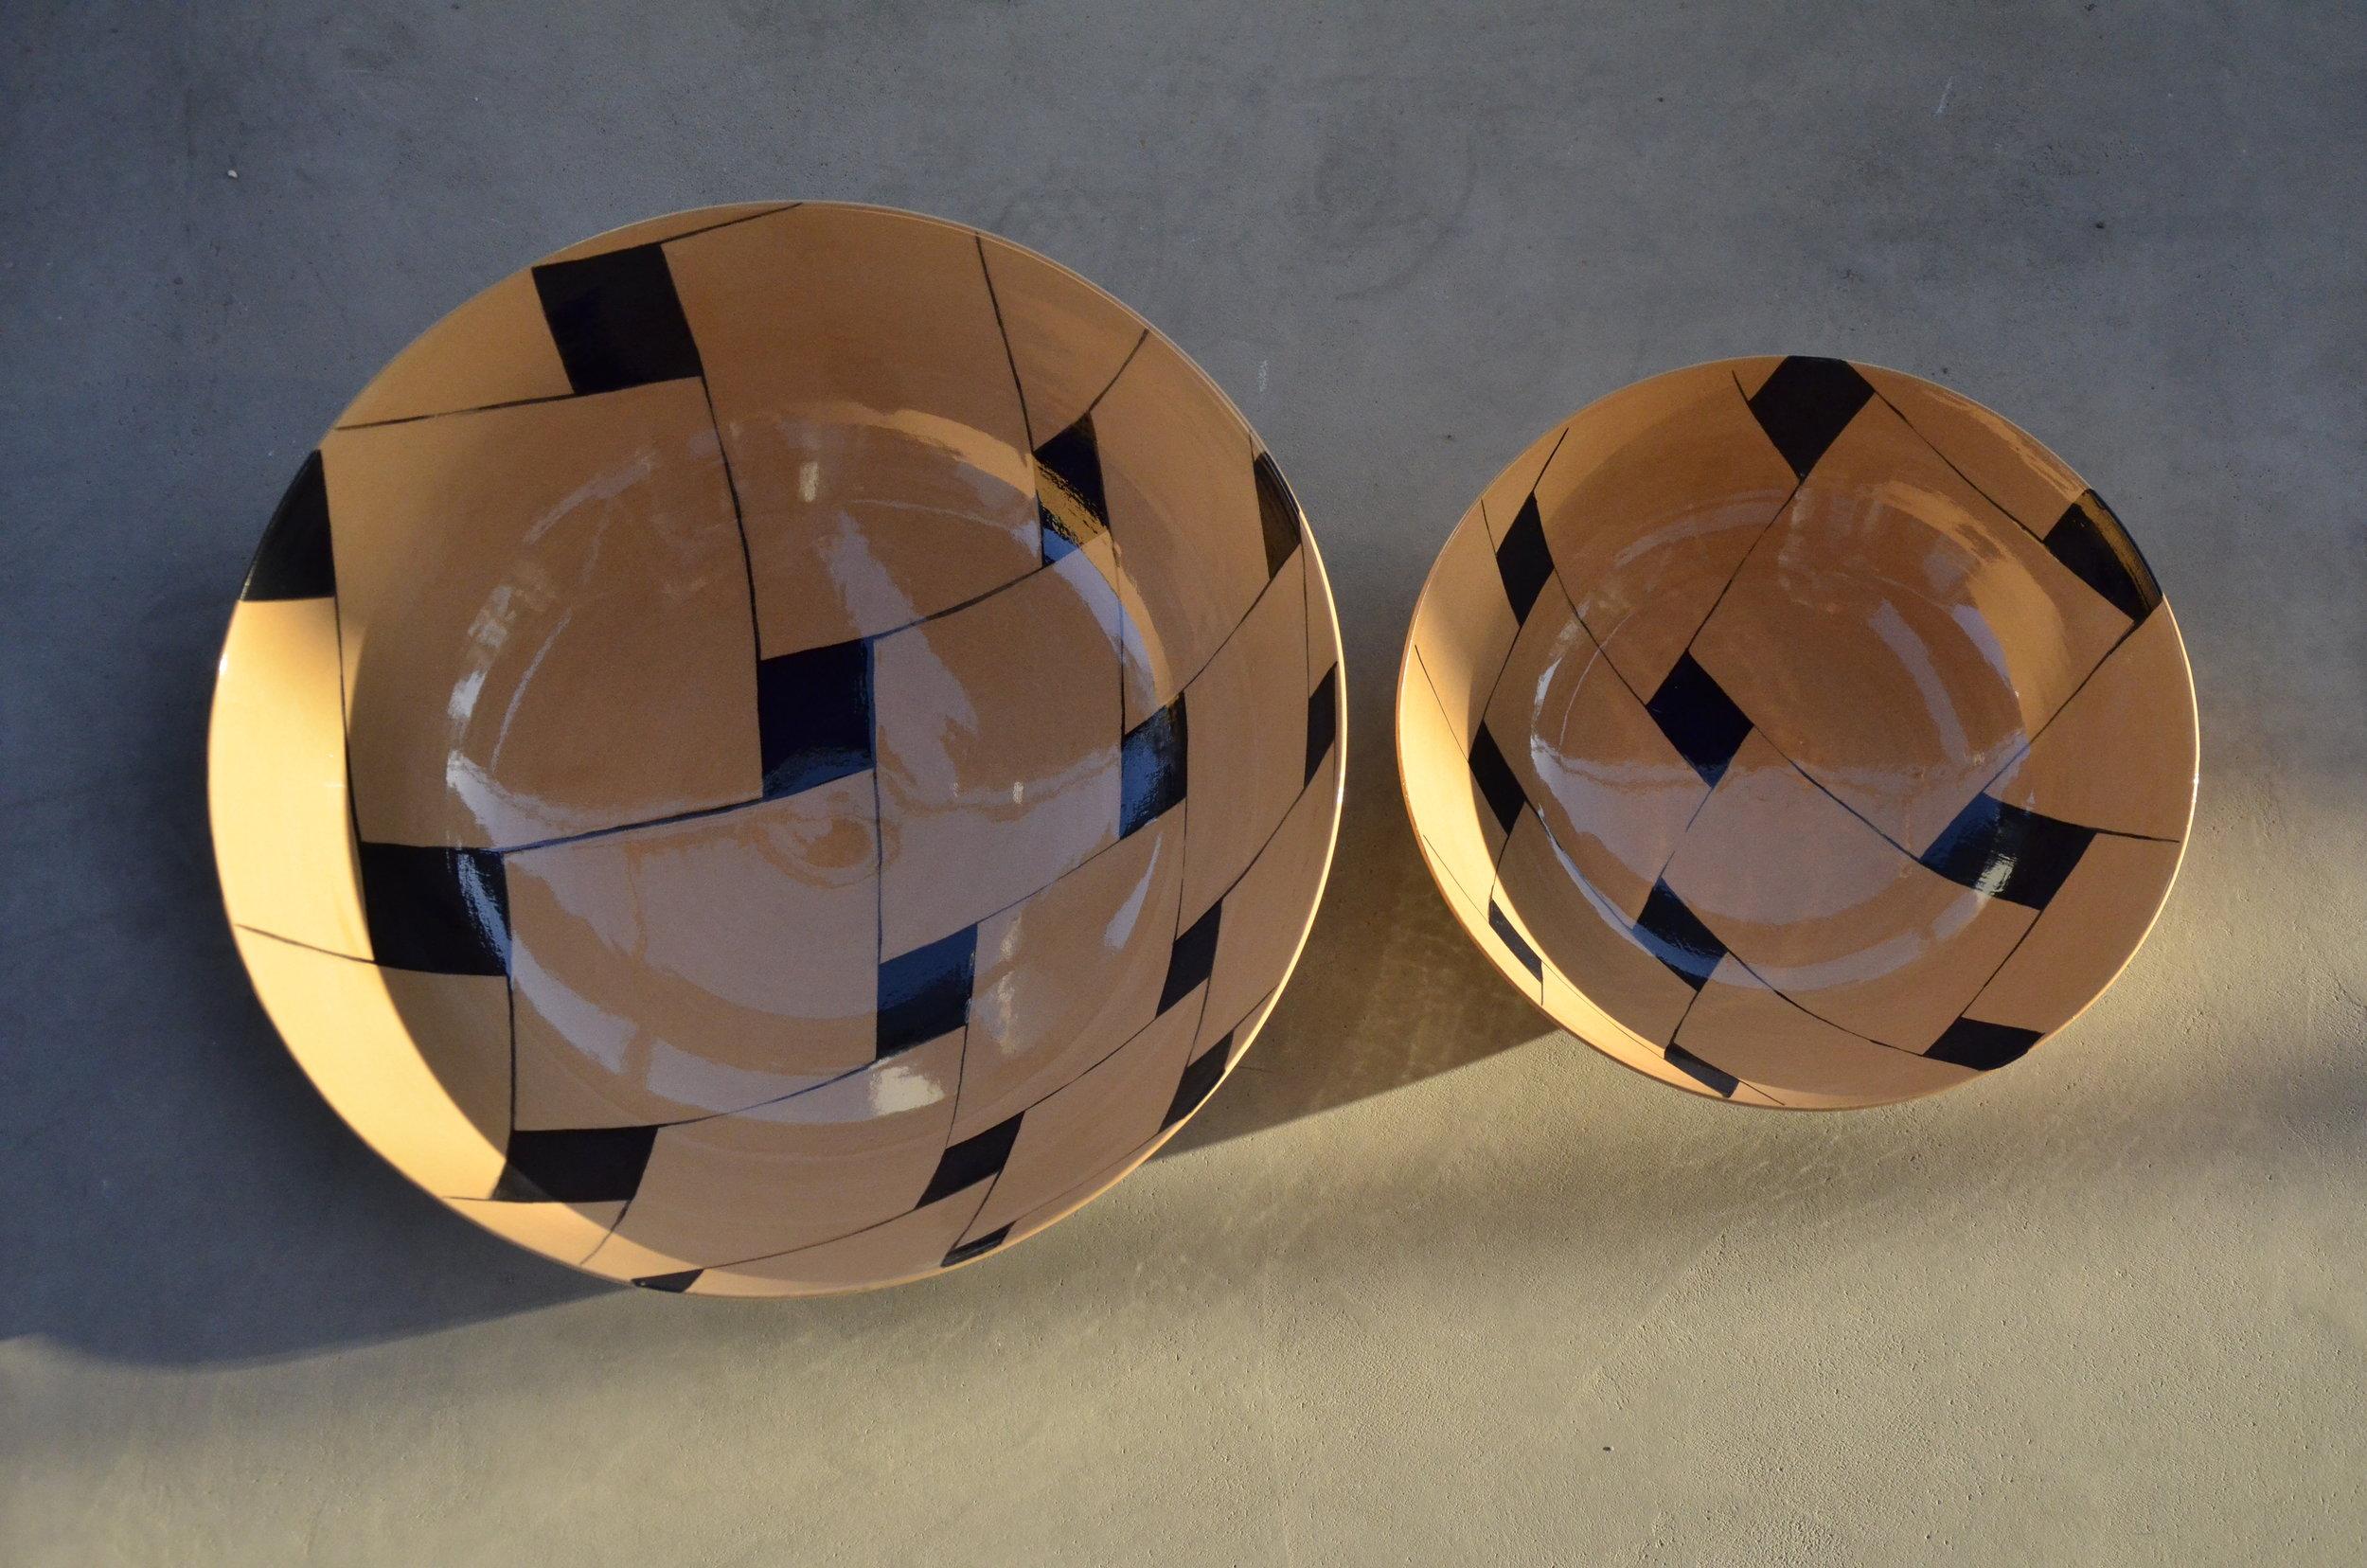 terra cotta ceramic body light black line tile perspective:  bowl 13x36cm(350E) bowl 9x26cm (150E)